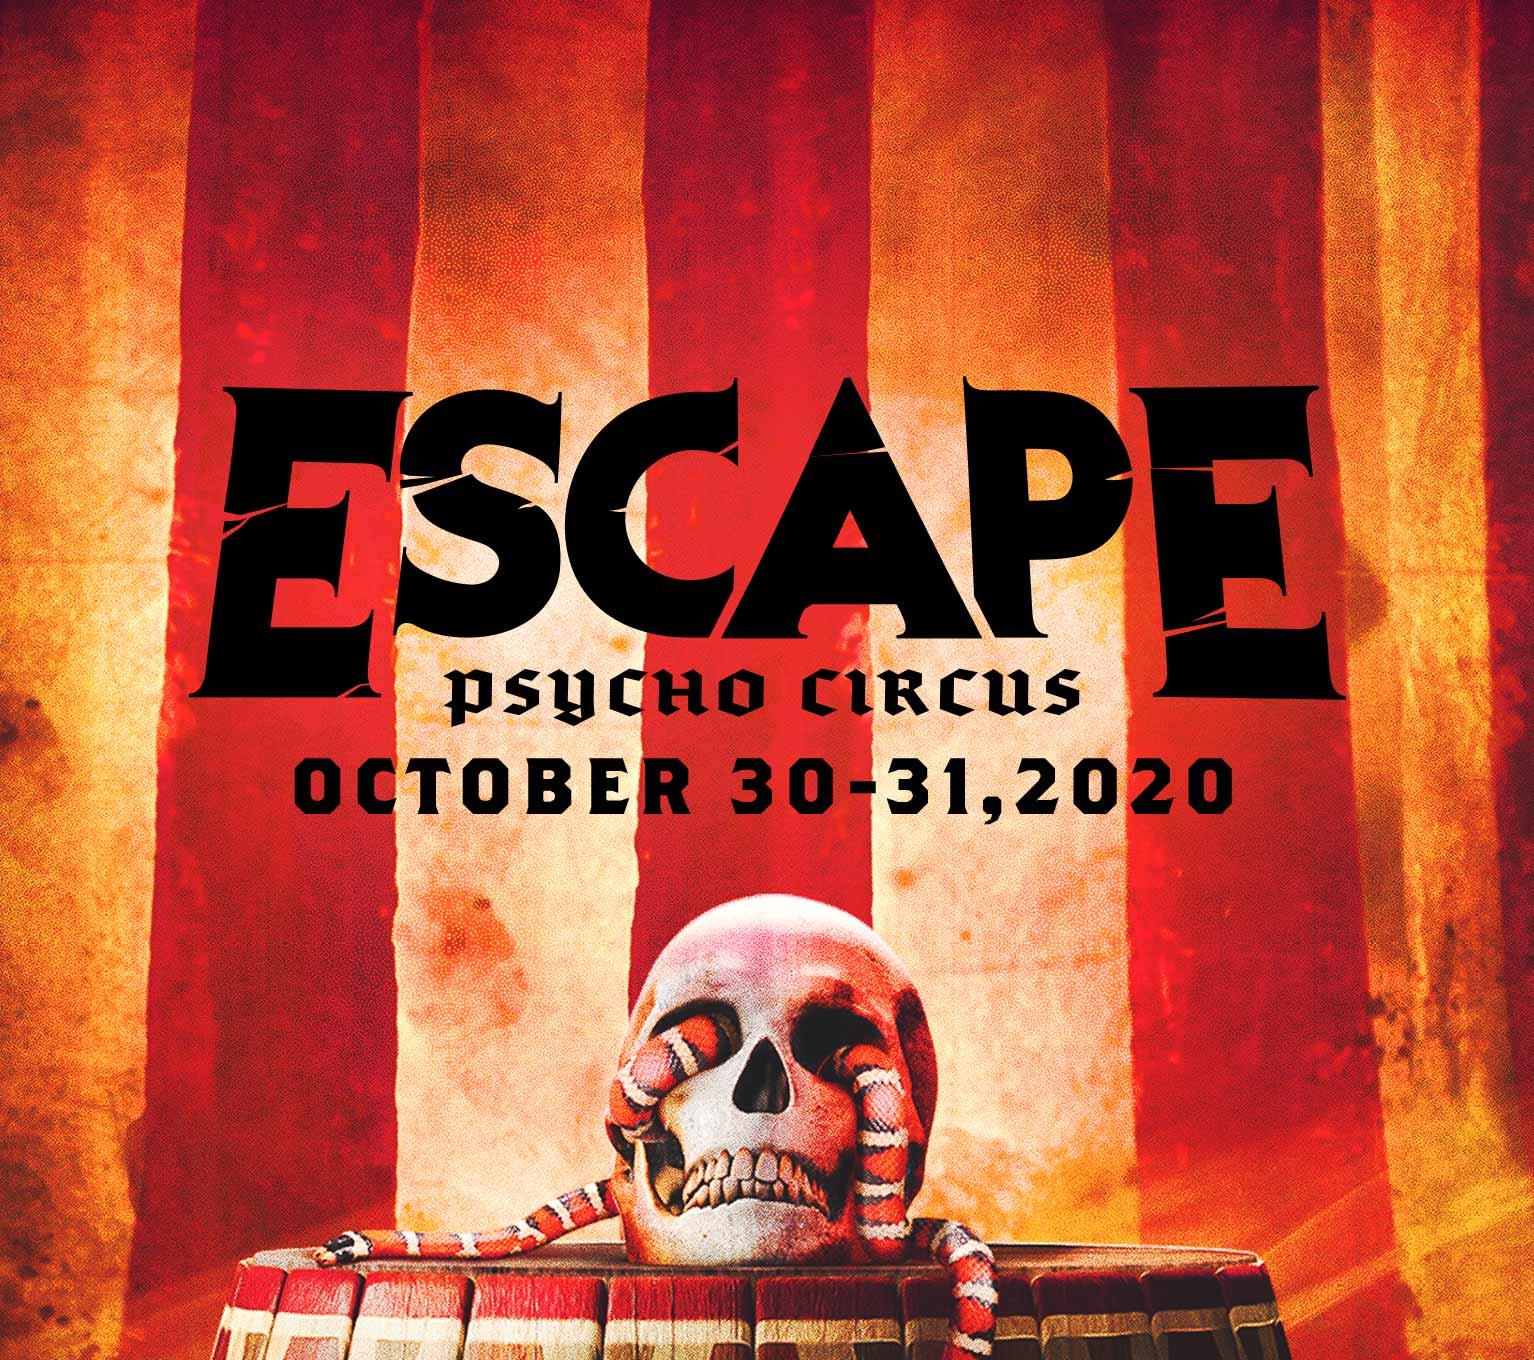 Escape: Psycho Circus | October 30 & 31, 2020